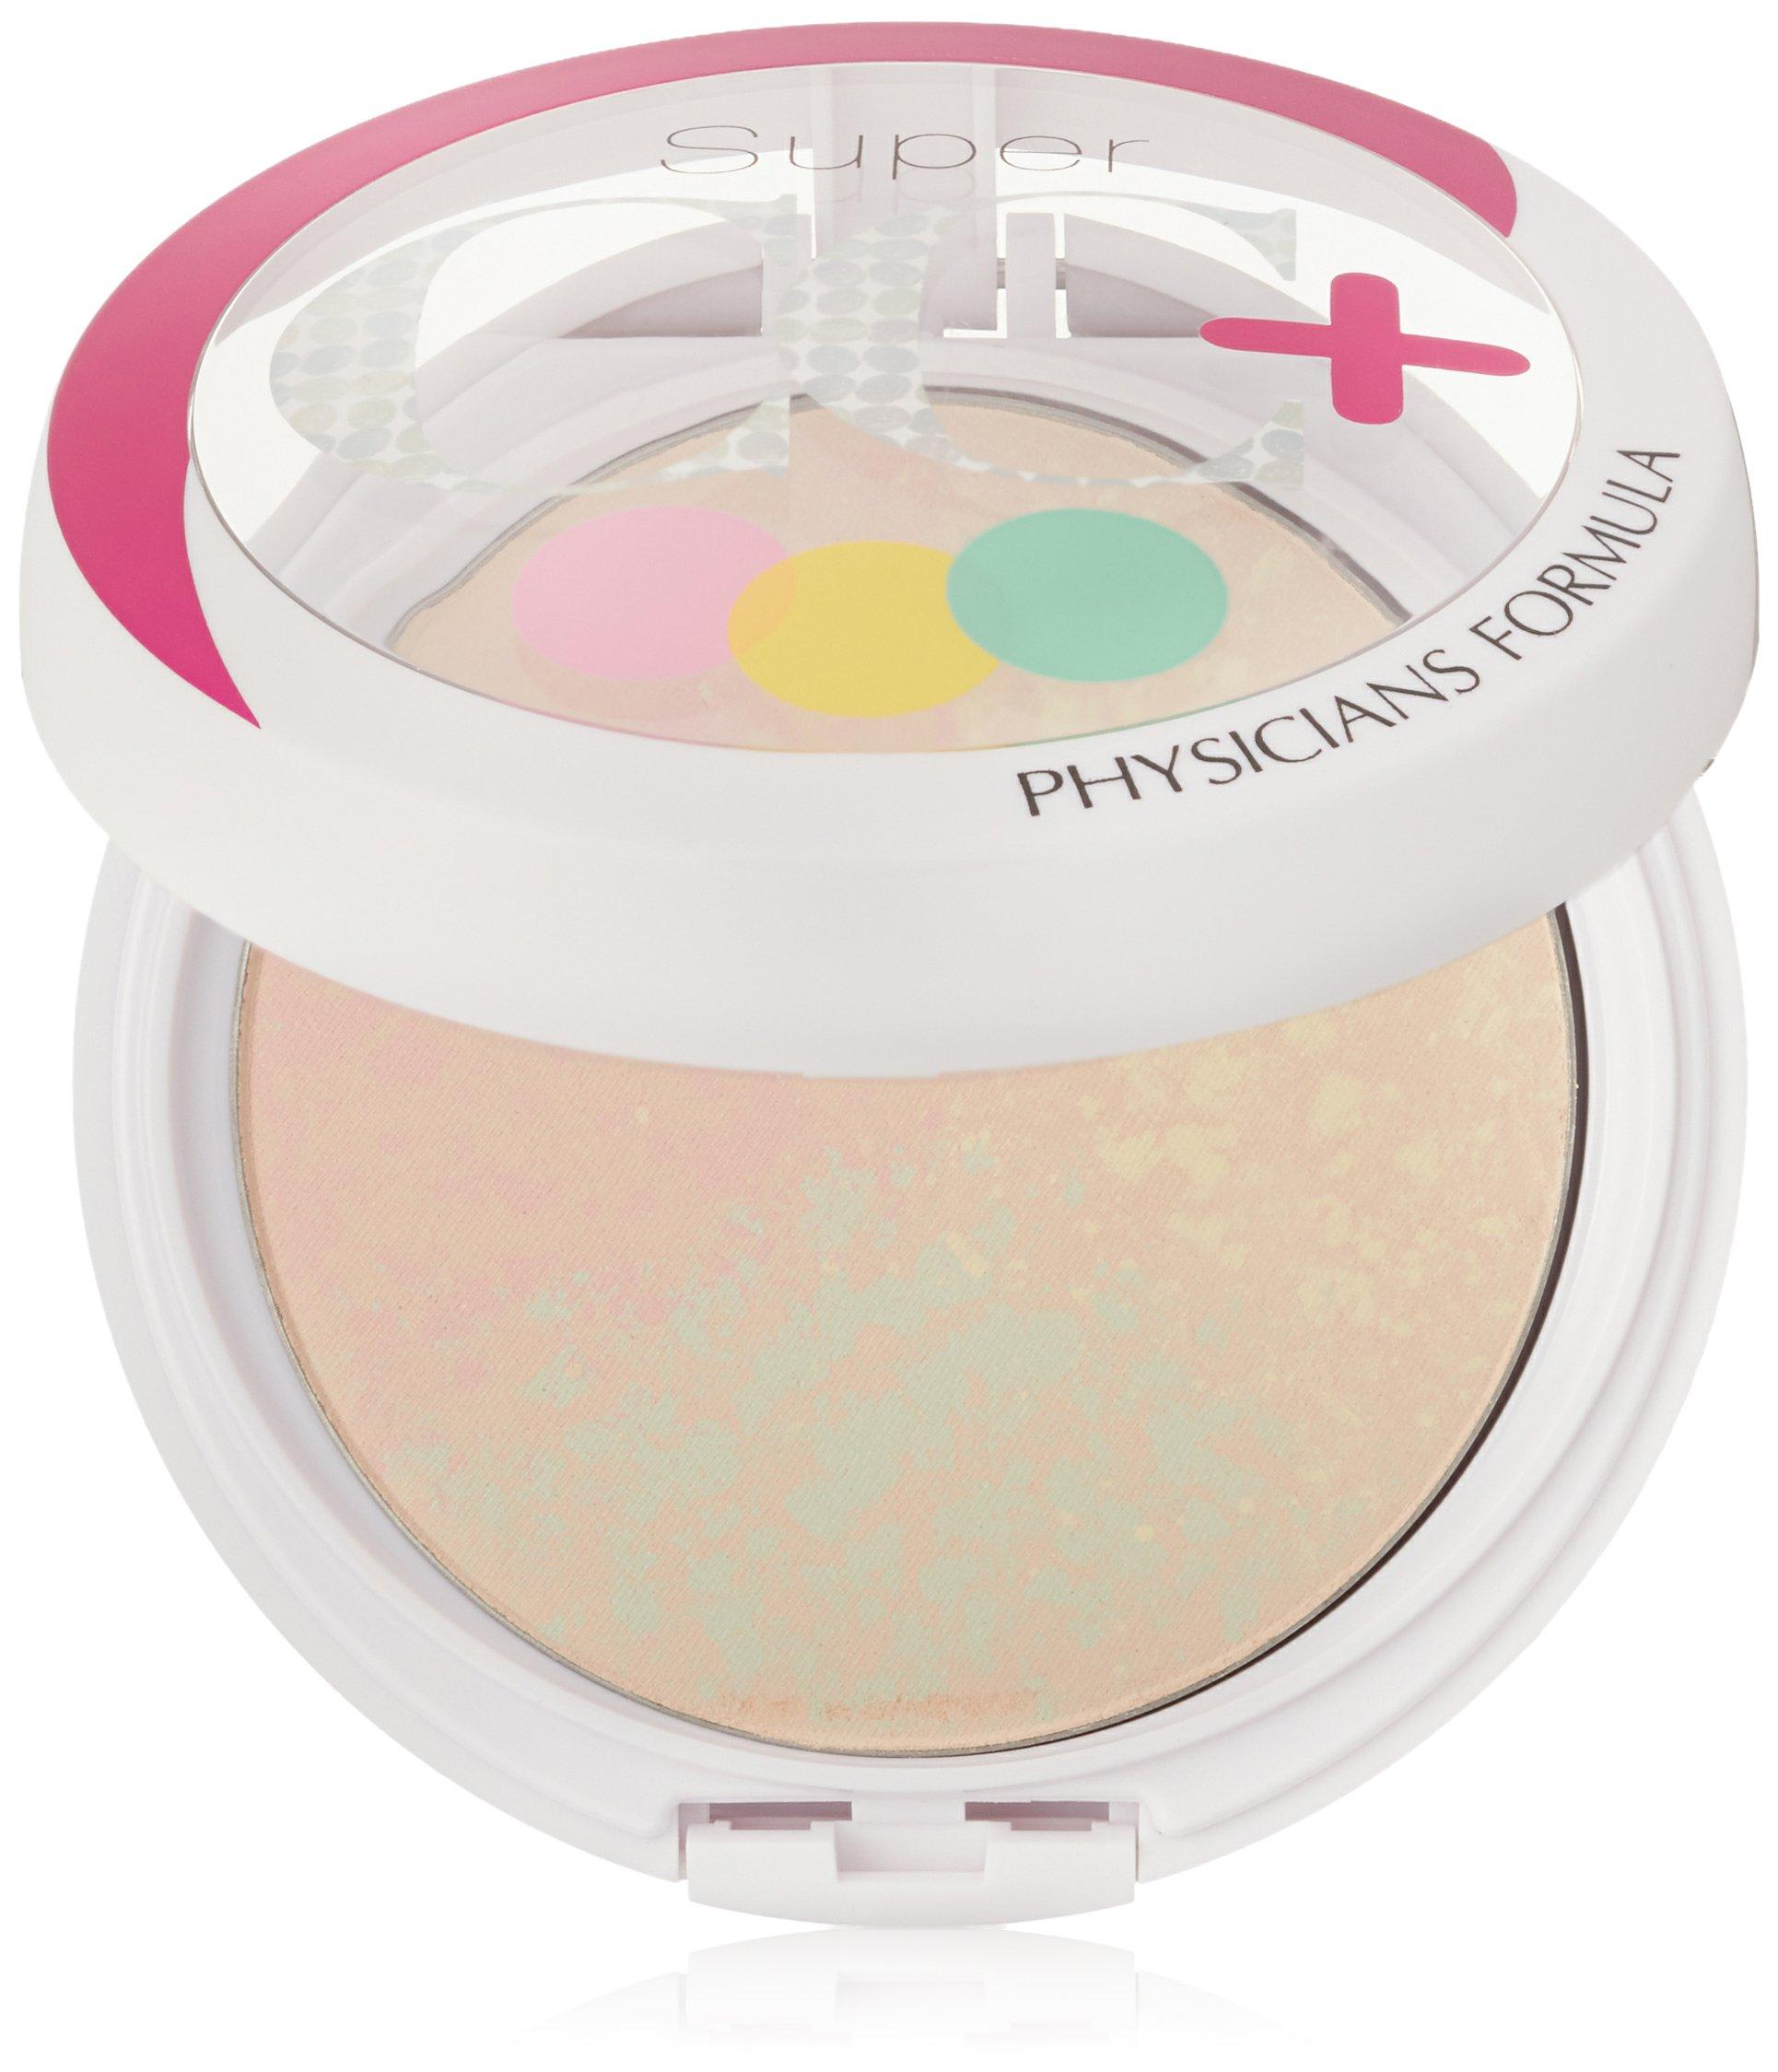 Physicians Formula Super CC+ Color-Correction + Care CC+ Powder SPF 30, Light, 0.3 Ounce